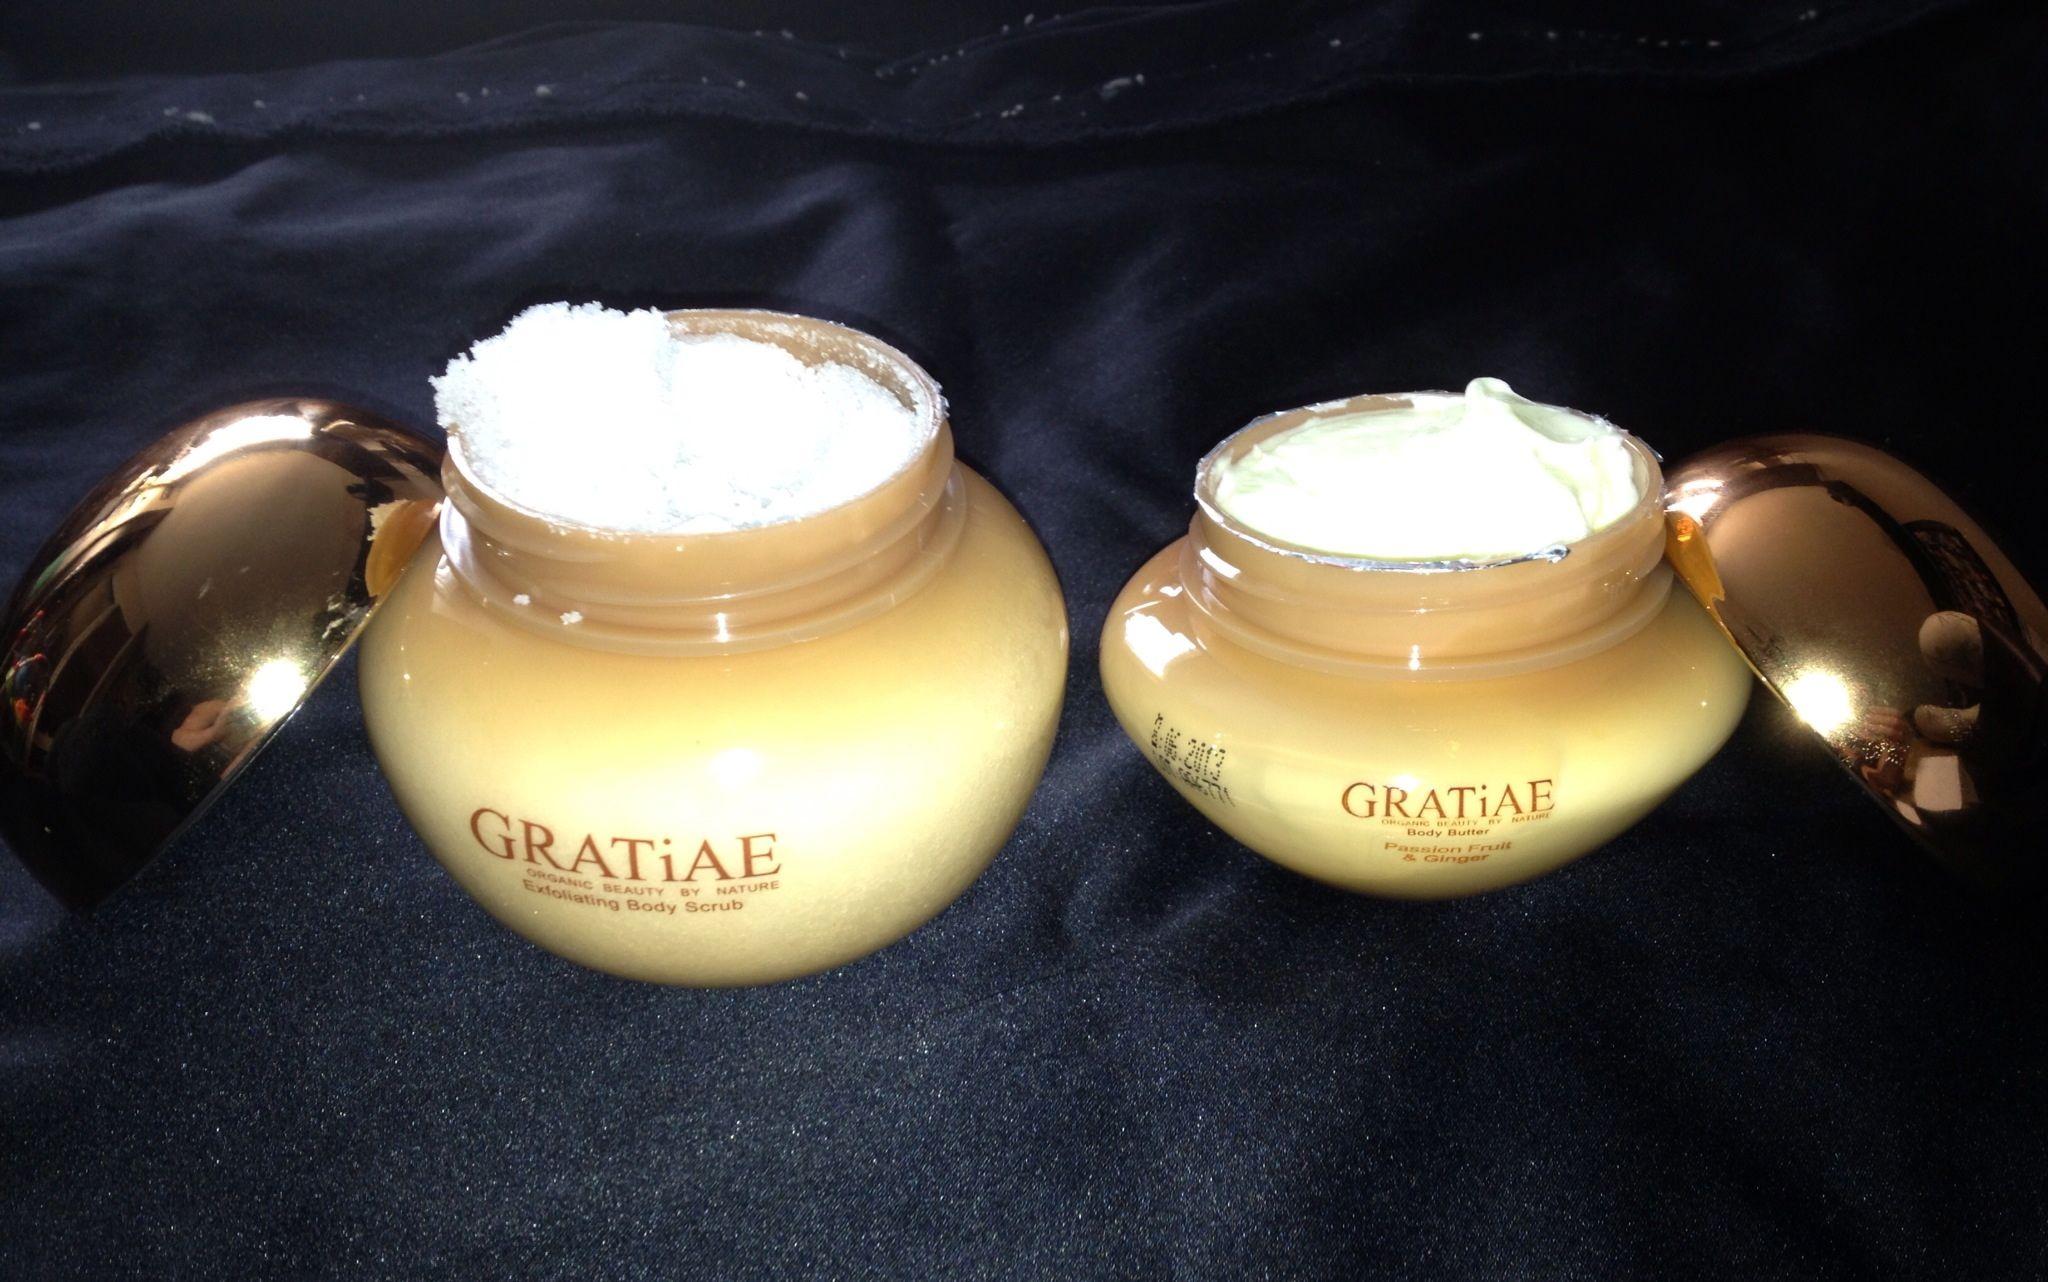 Gratiae Organic Beauty By Nature Reviews